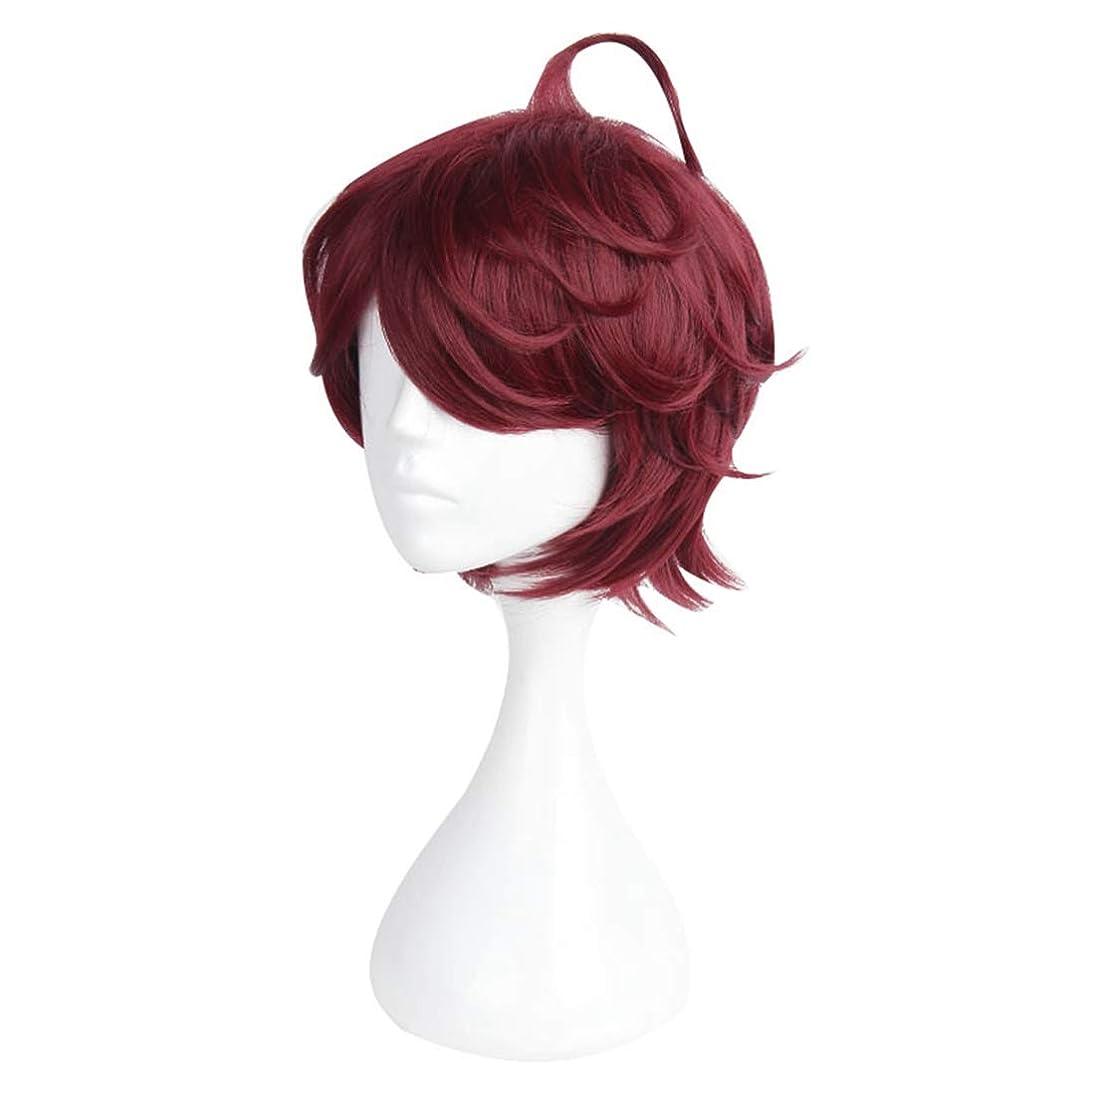 Koloeplf 音楽ハンドゲームロールウィッグコスプレ衣装ウィッグメンズダークレッドショートヘアウィッグ (Color : Dark red)